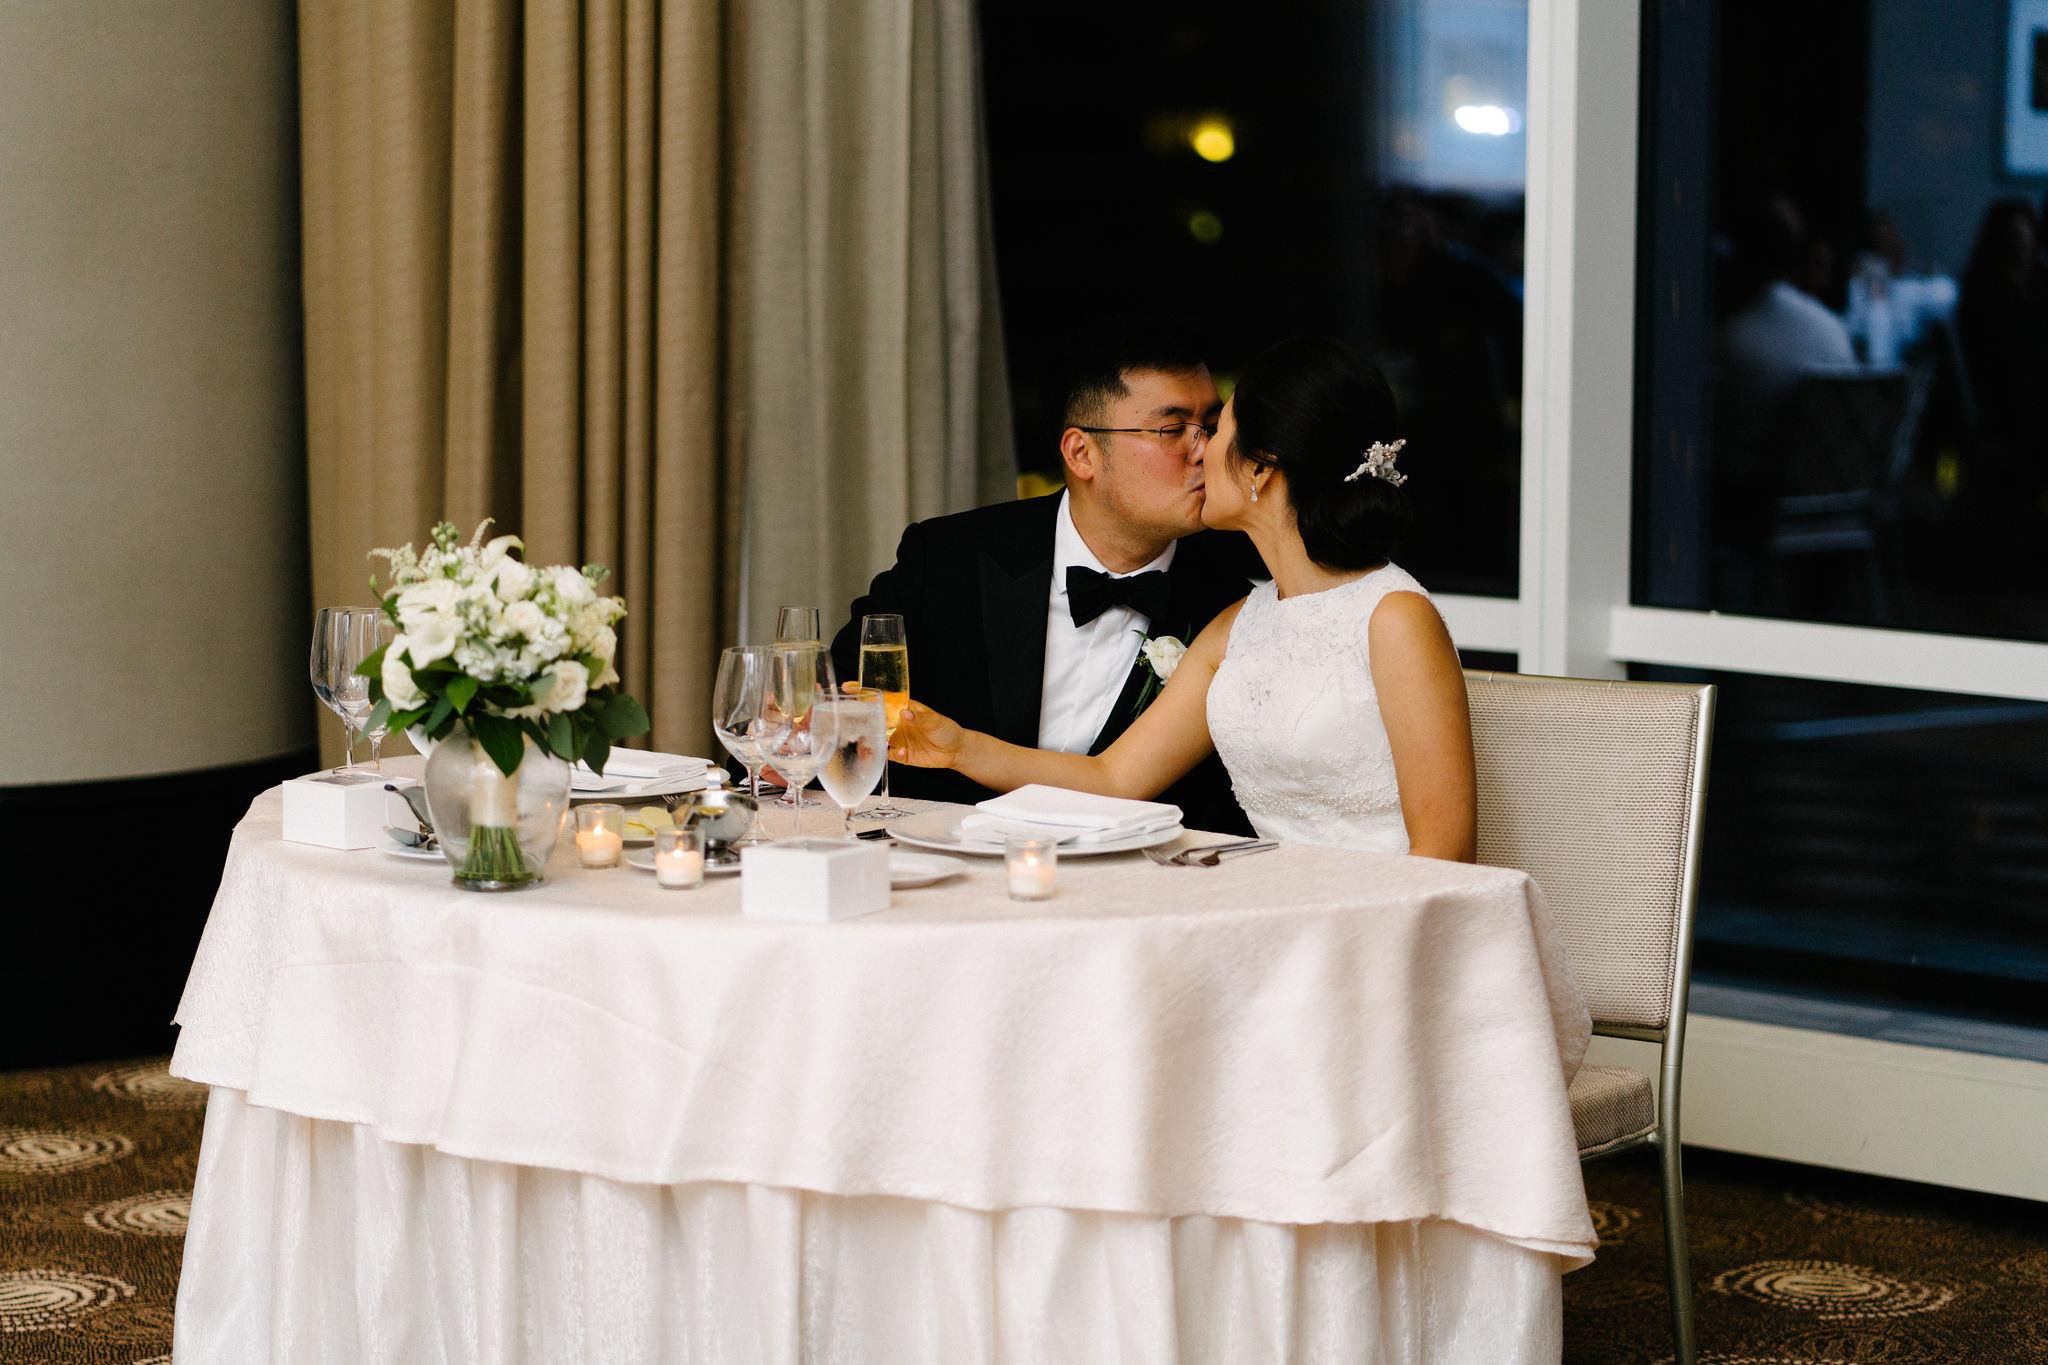 045-rempel-photography-chicago-wedding-inspiration-sara-philip-rockefeller-chapel-trump-tower.jpg